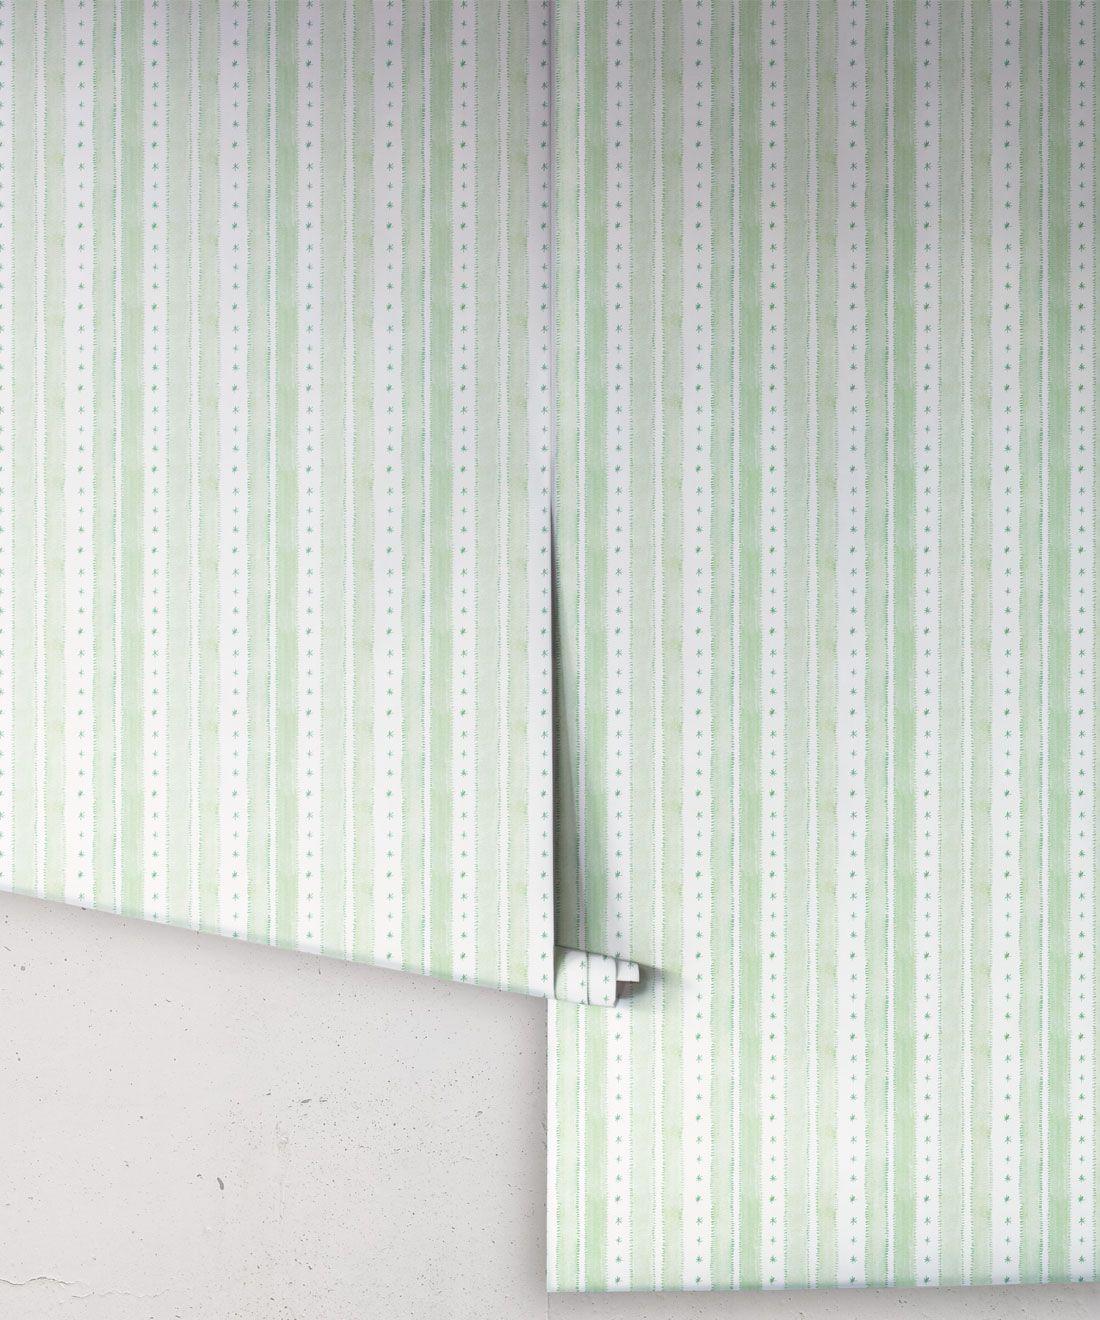 Star Stripe Wallpaper • Green • Rolls